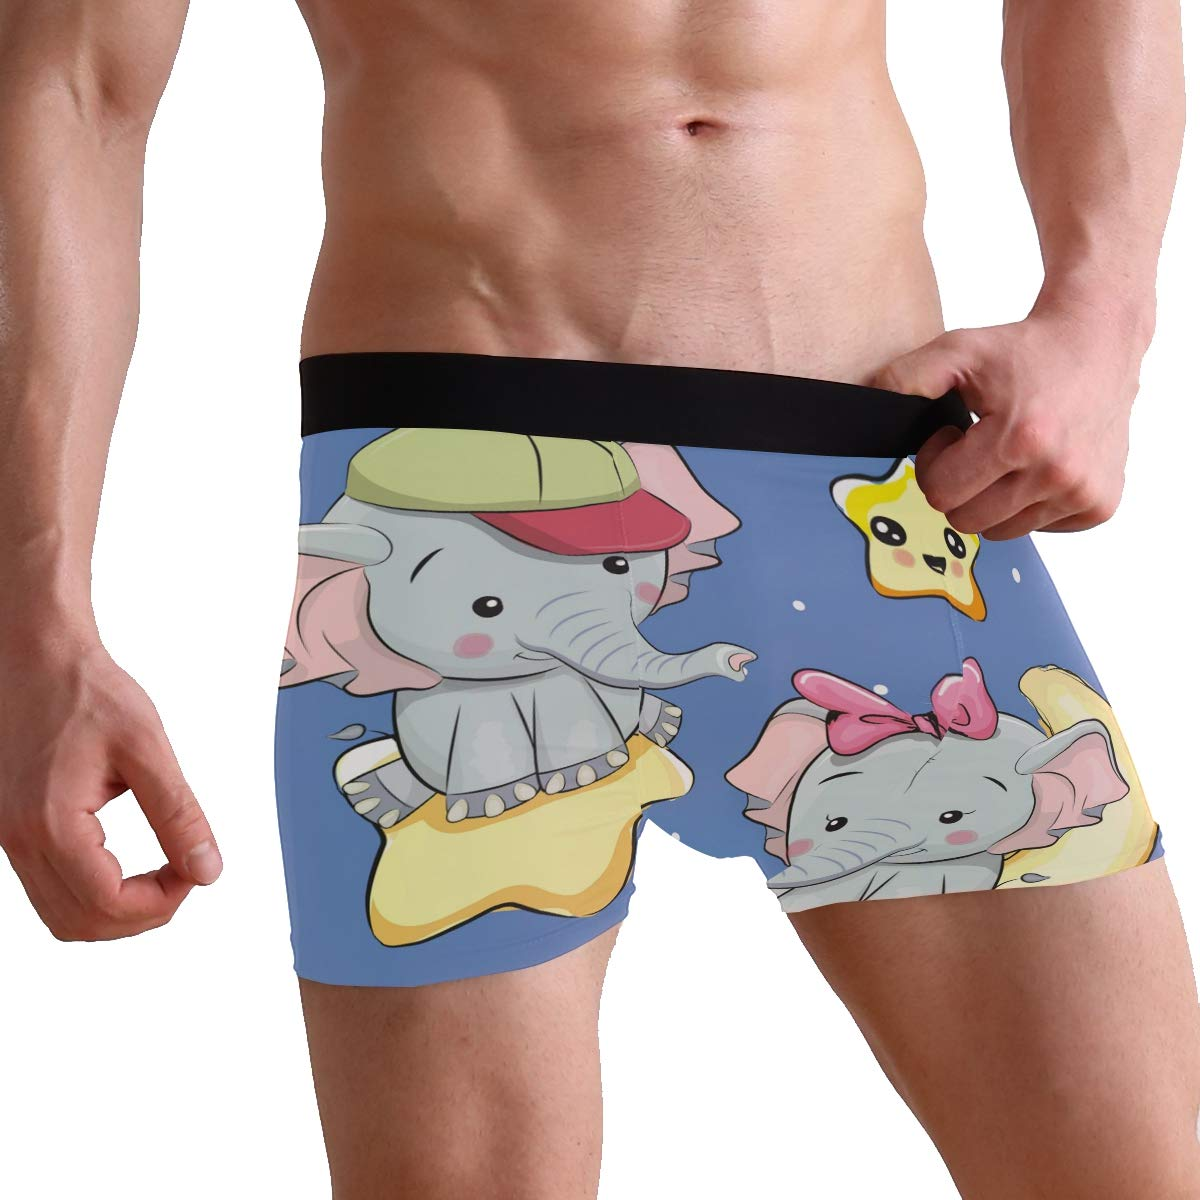 Elephant Galaxy Star Moon Short Underwear Soft Stretch Underpants for Men Boys S-XL BETTKEN Mens Boxer Briefs